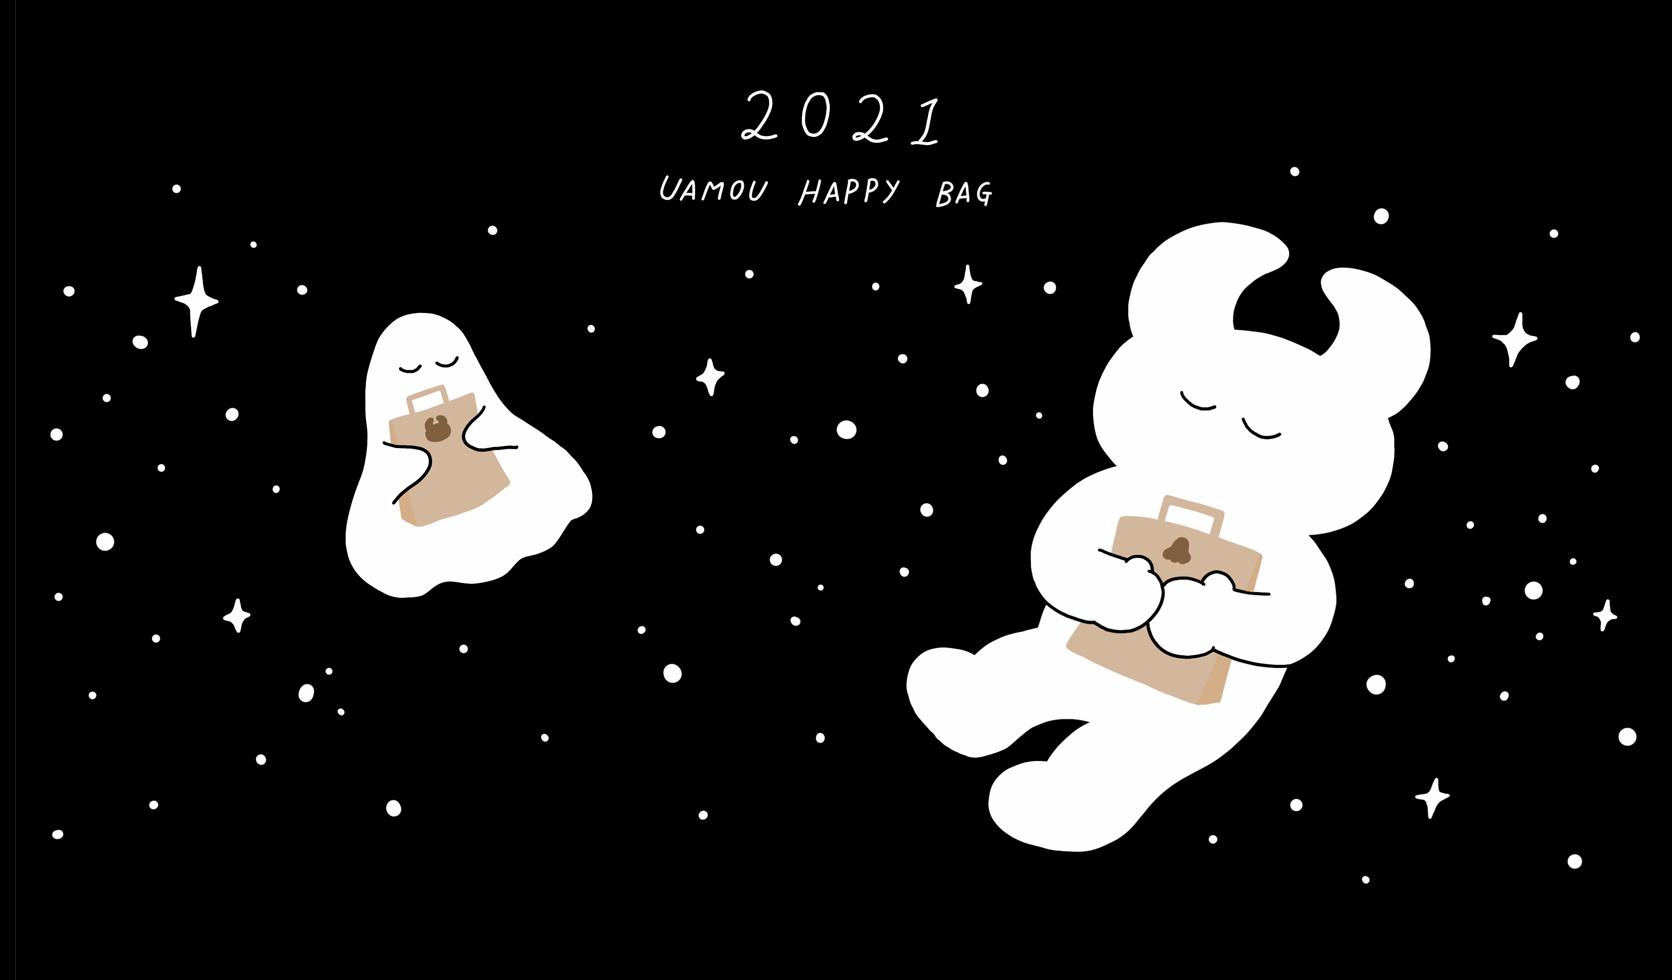 happybag_2021